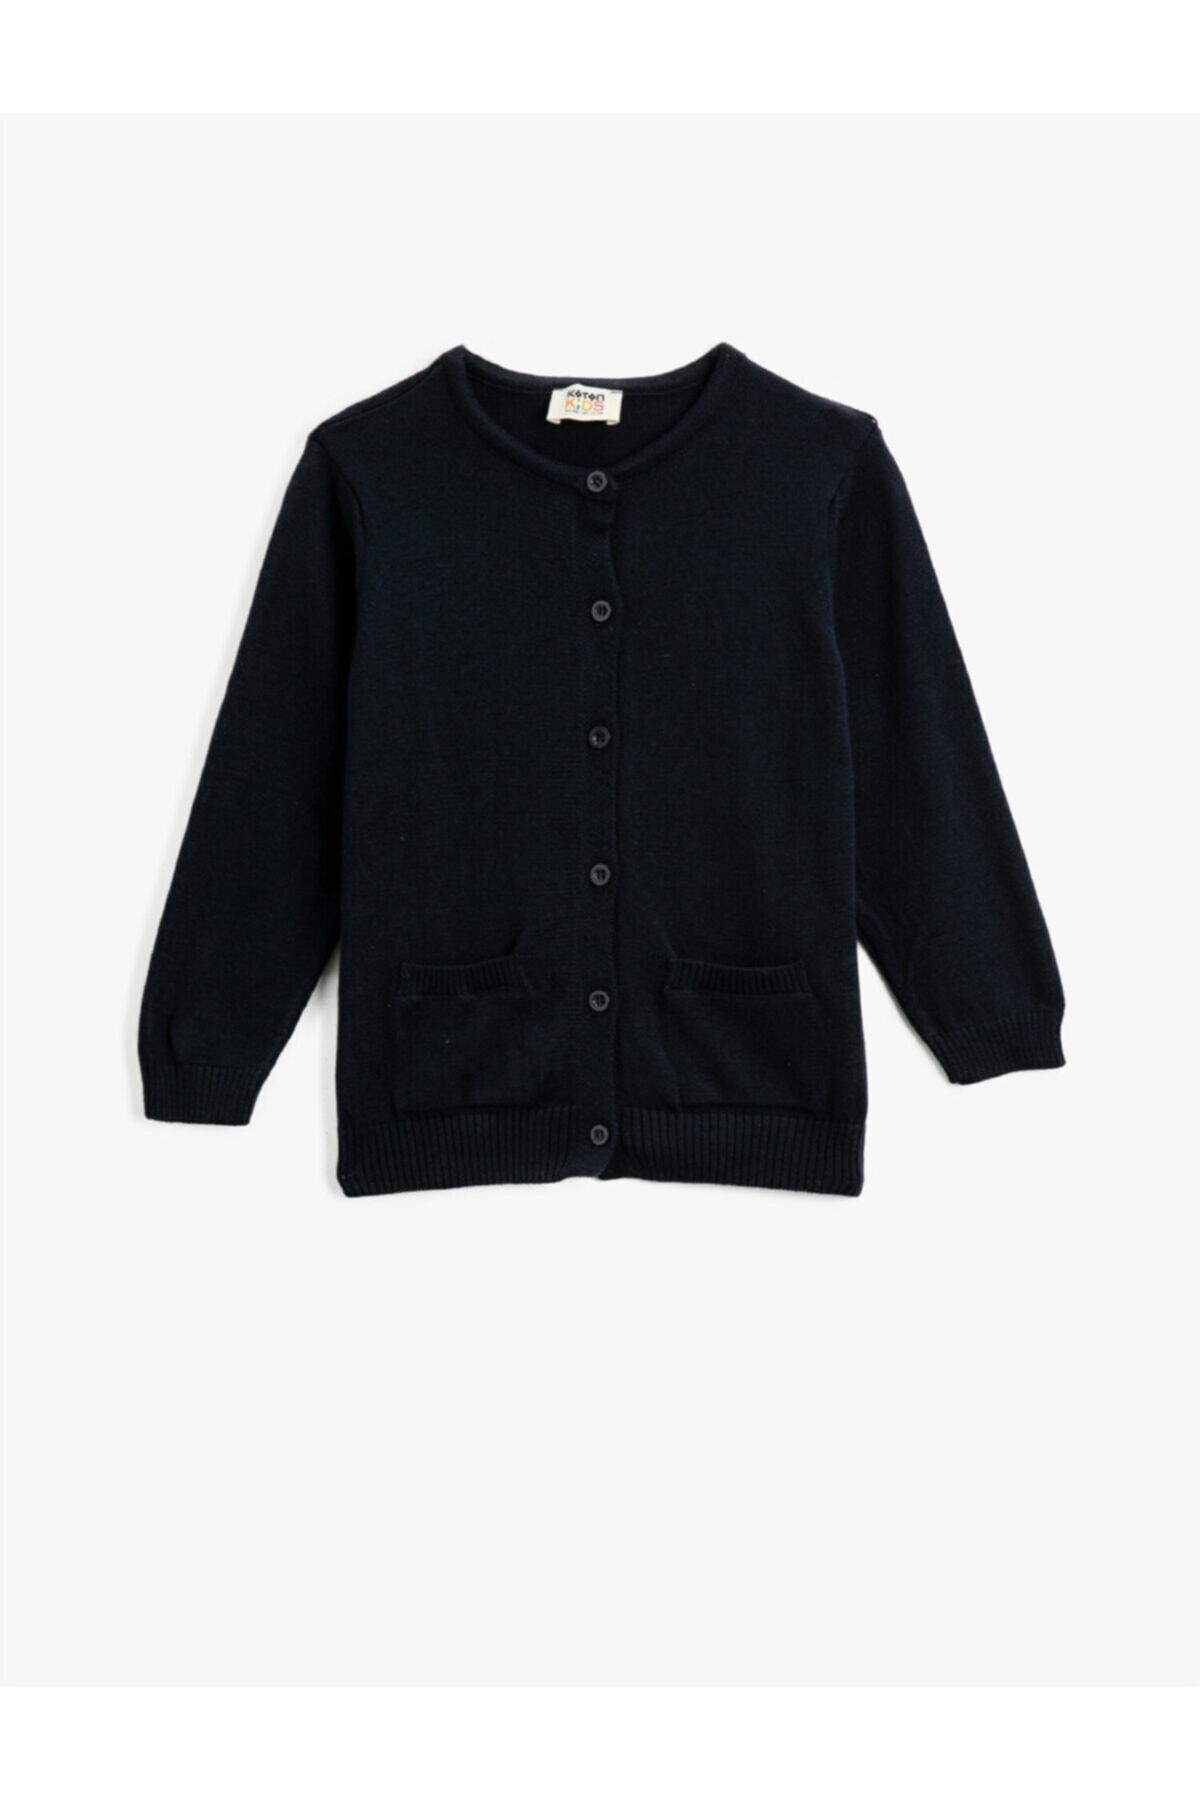 ژاکت خاص برند Koton Kids رنگ لاجوردی کد ty65062502